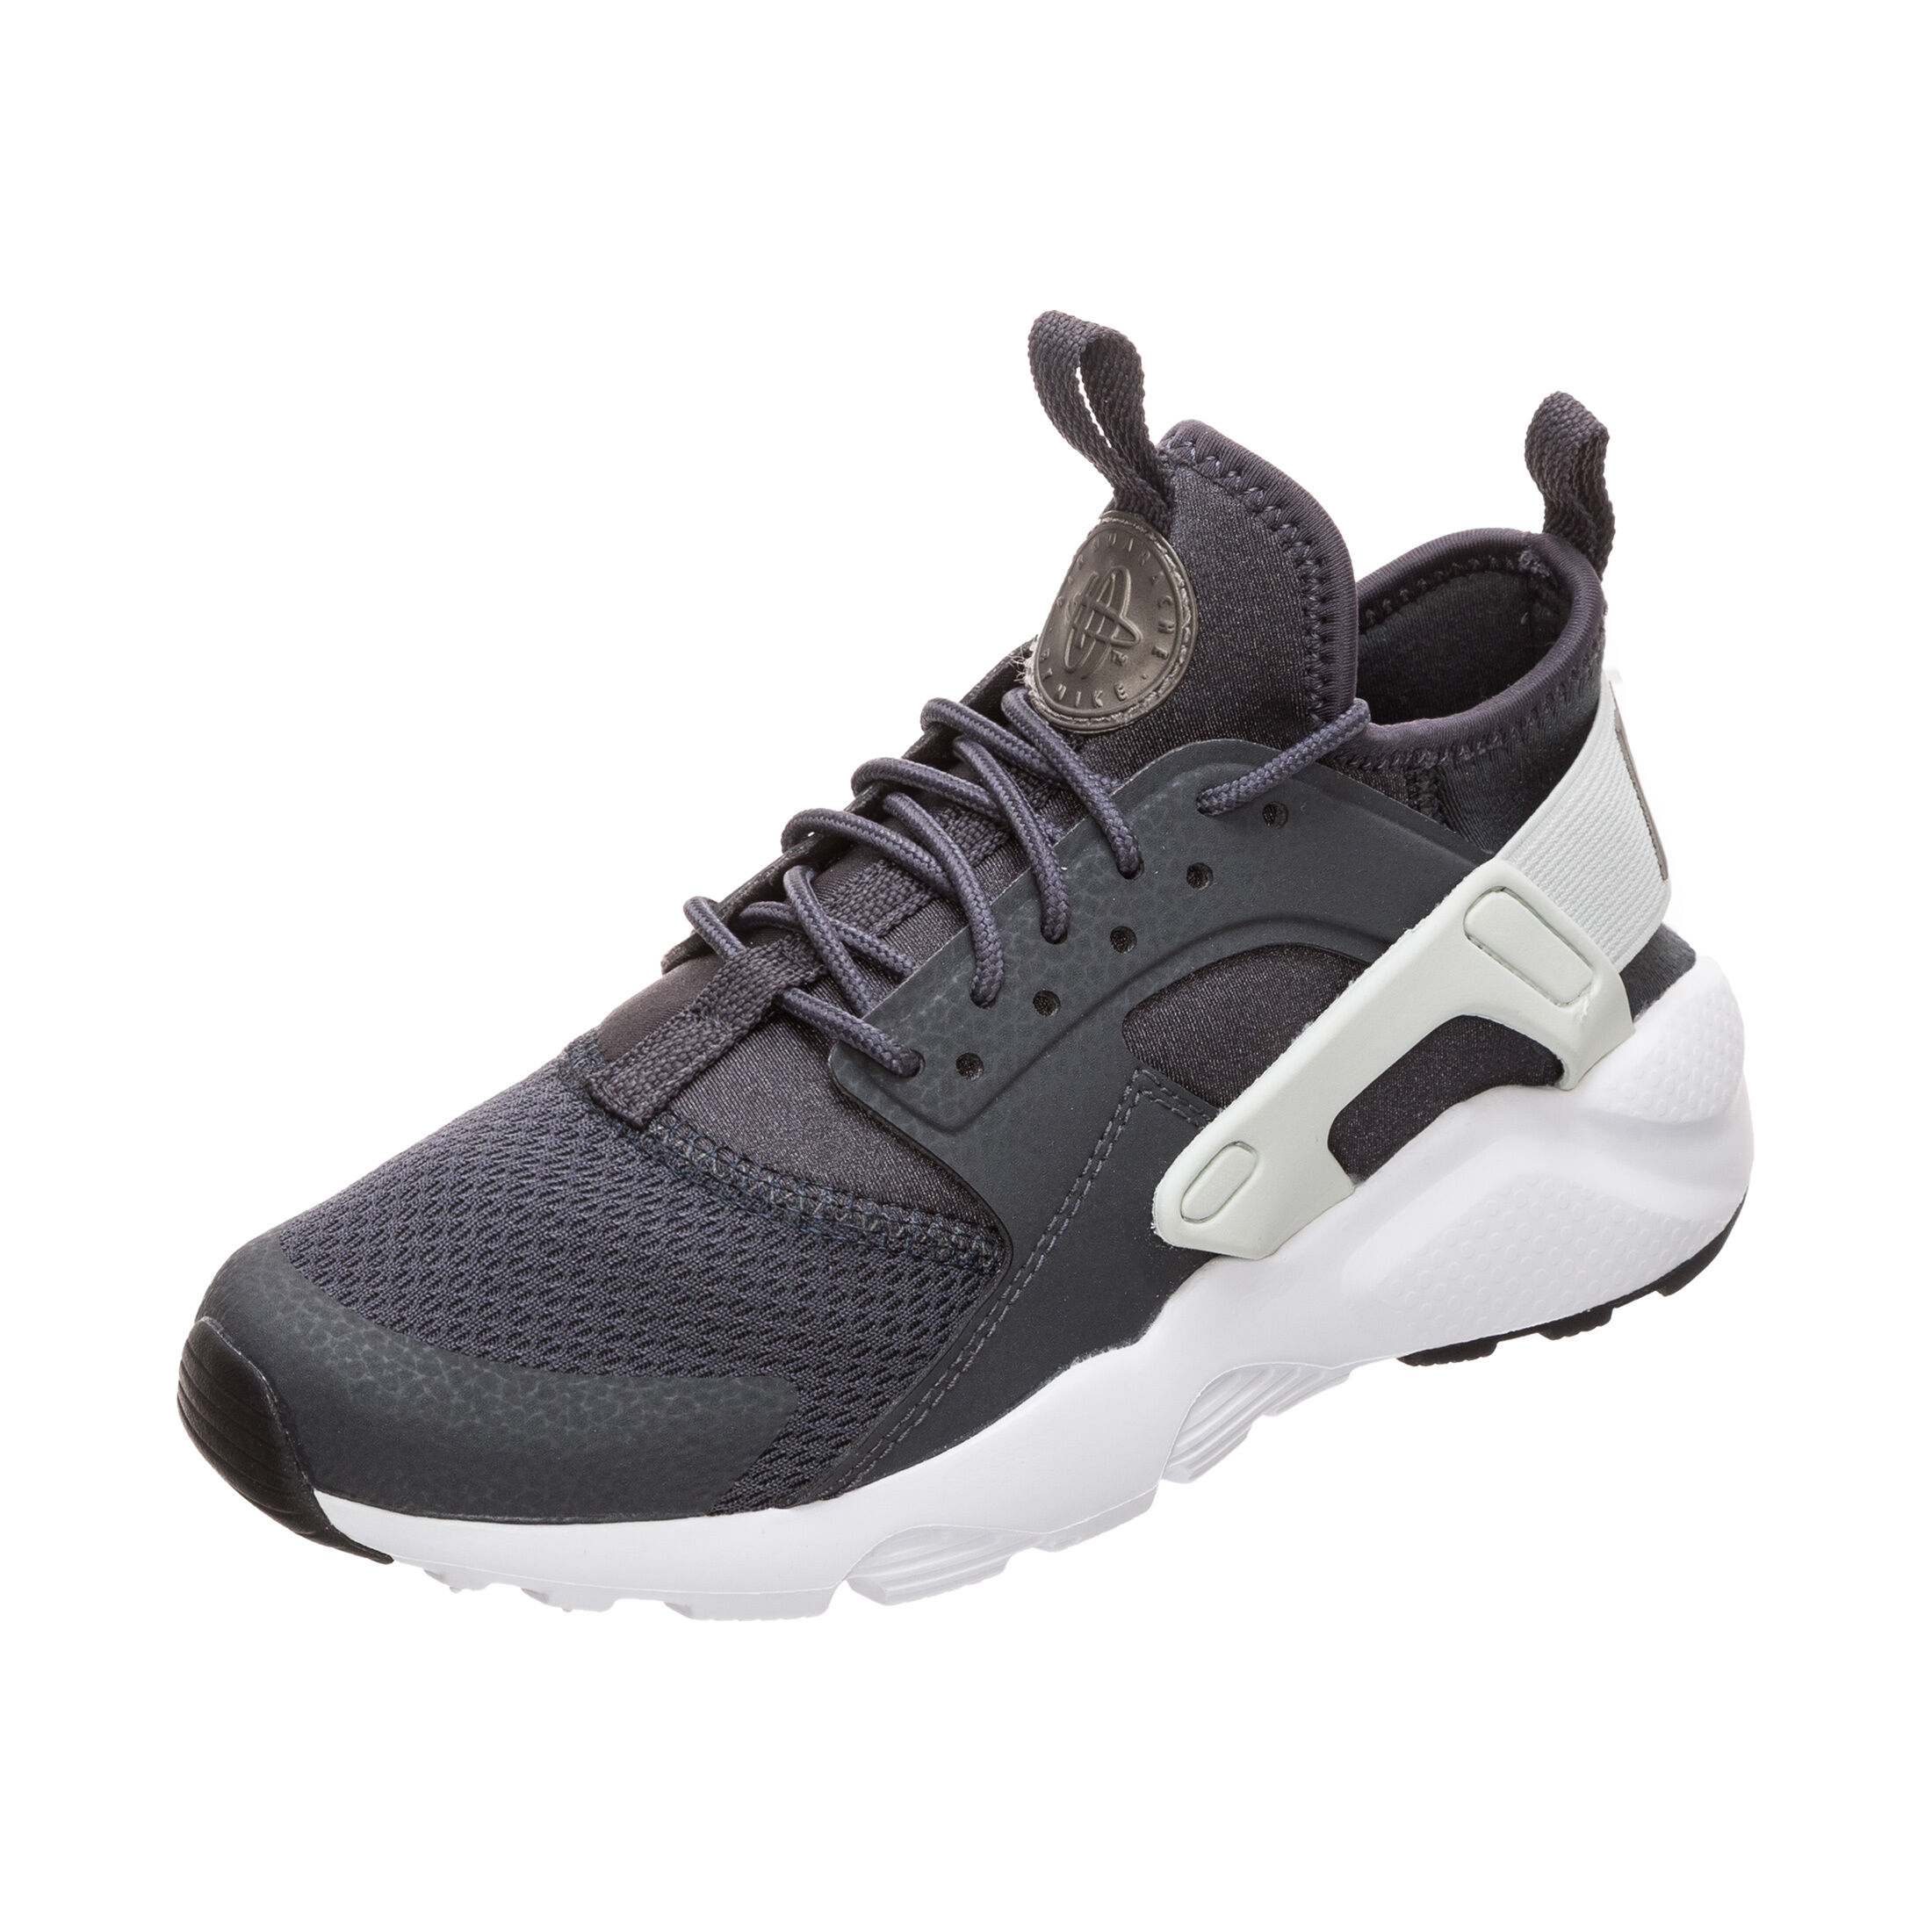 Kinder Run Sneaker Air Huarache Ultra wO0Pkn